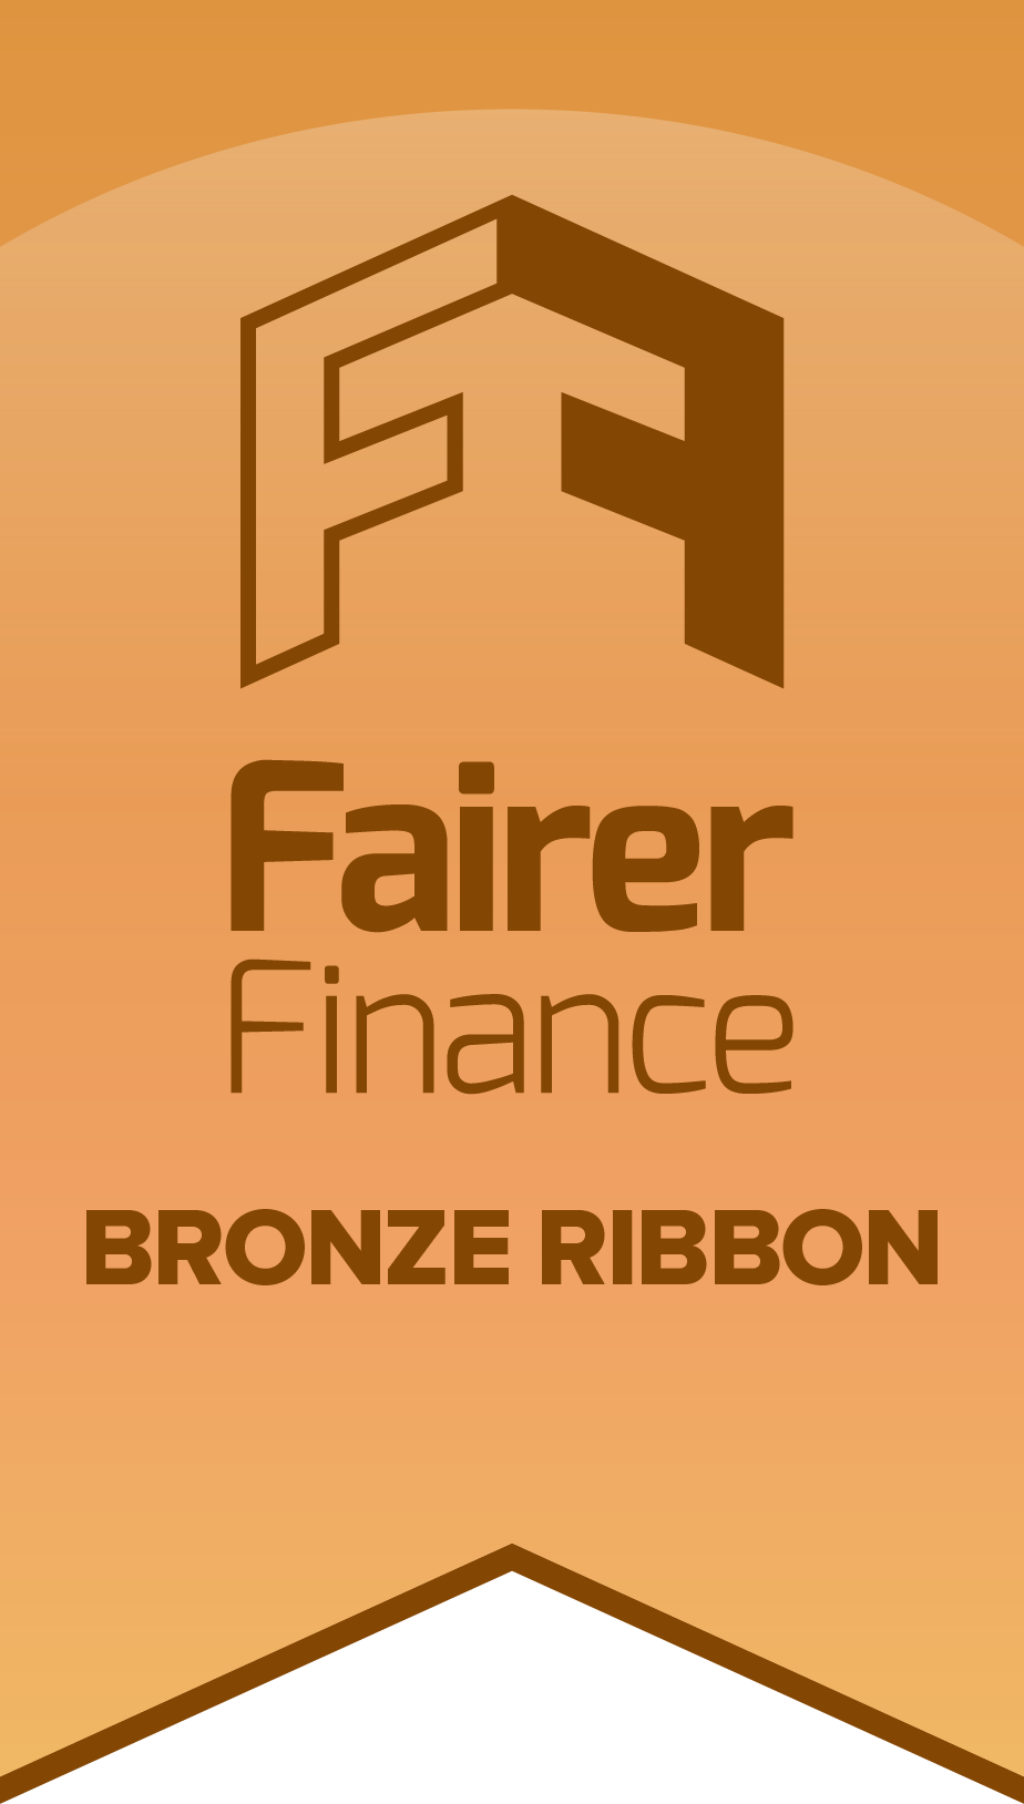 Bronze ribbon